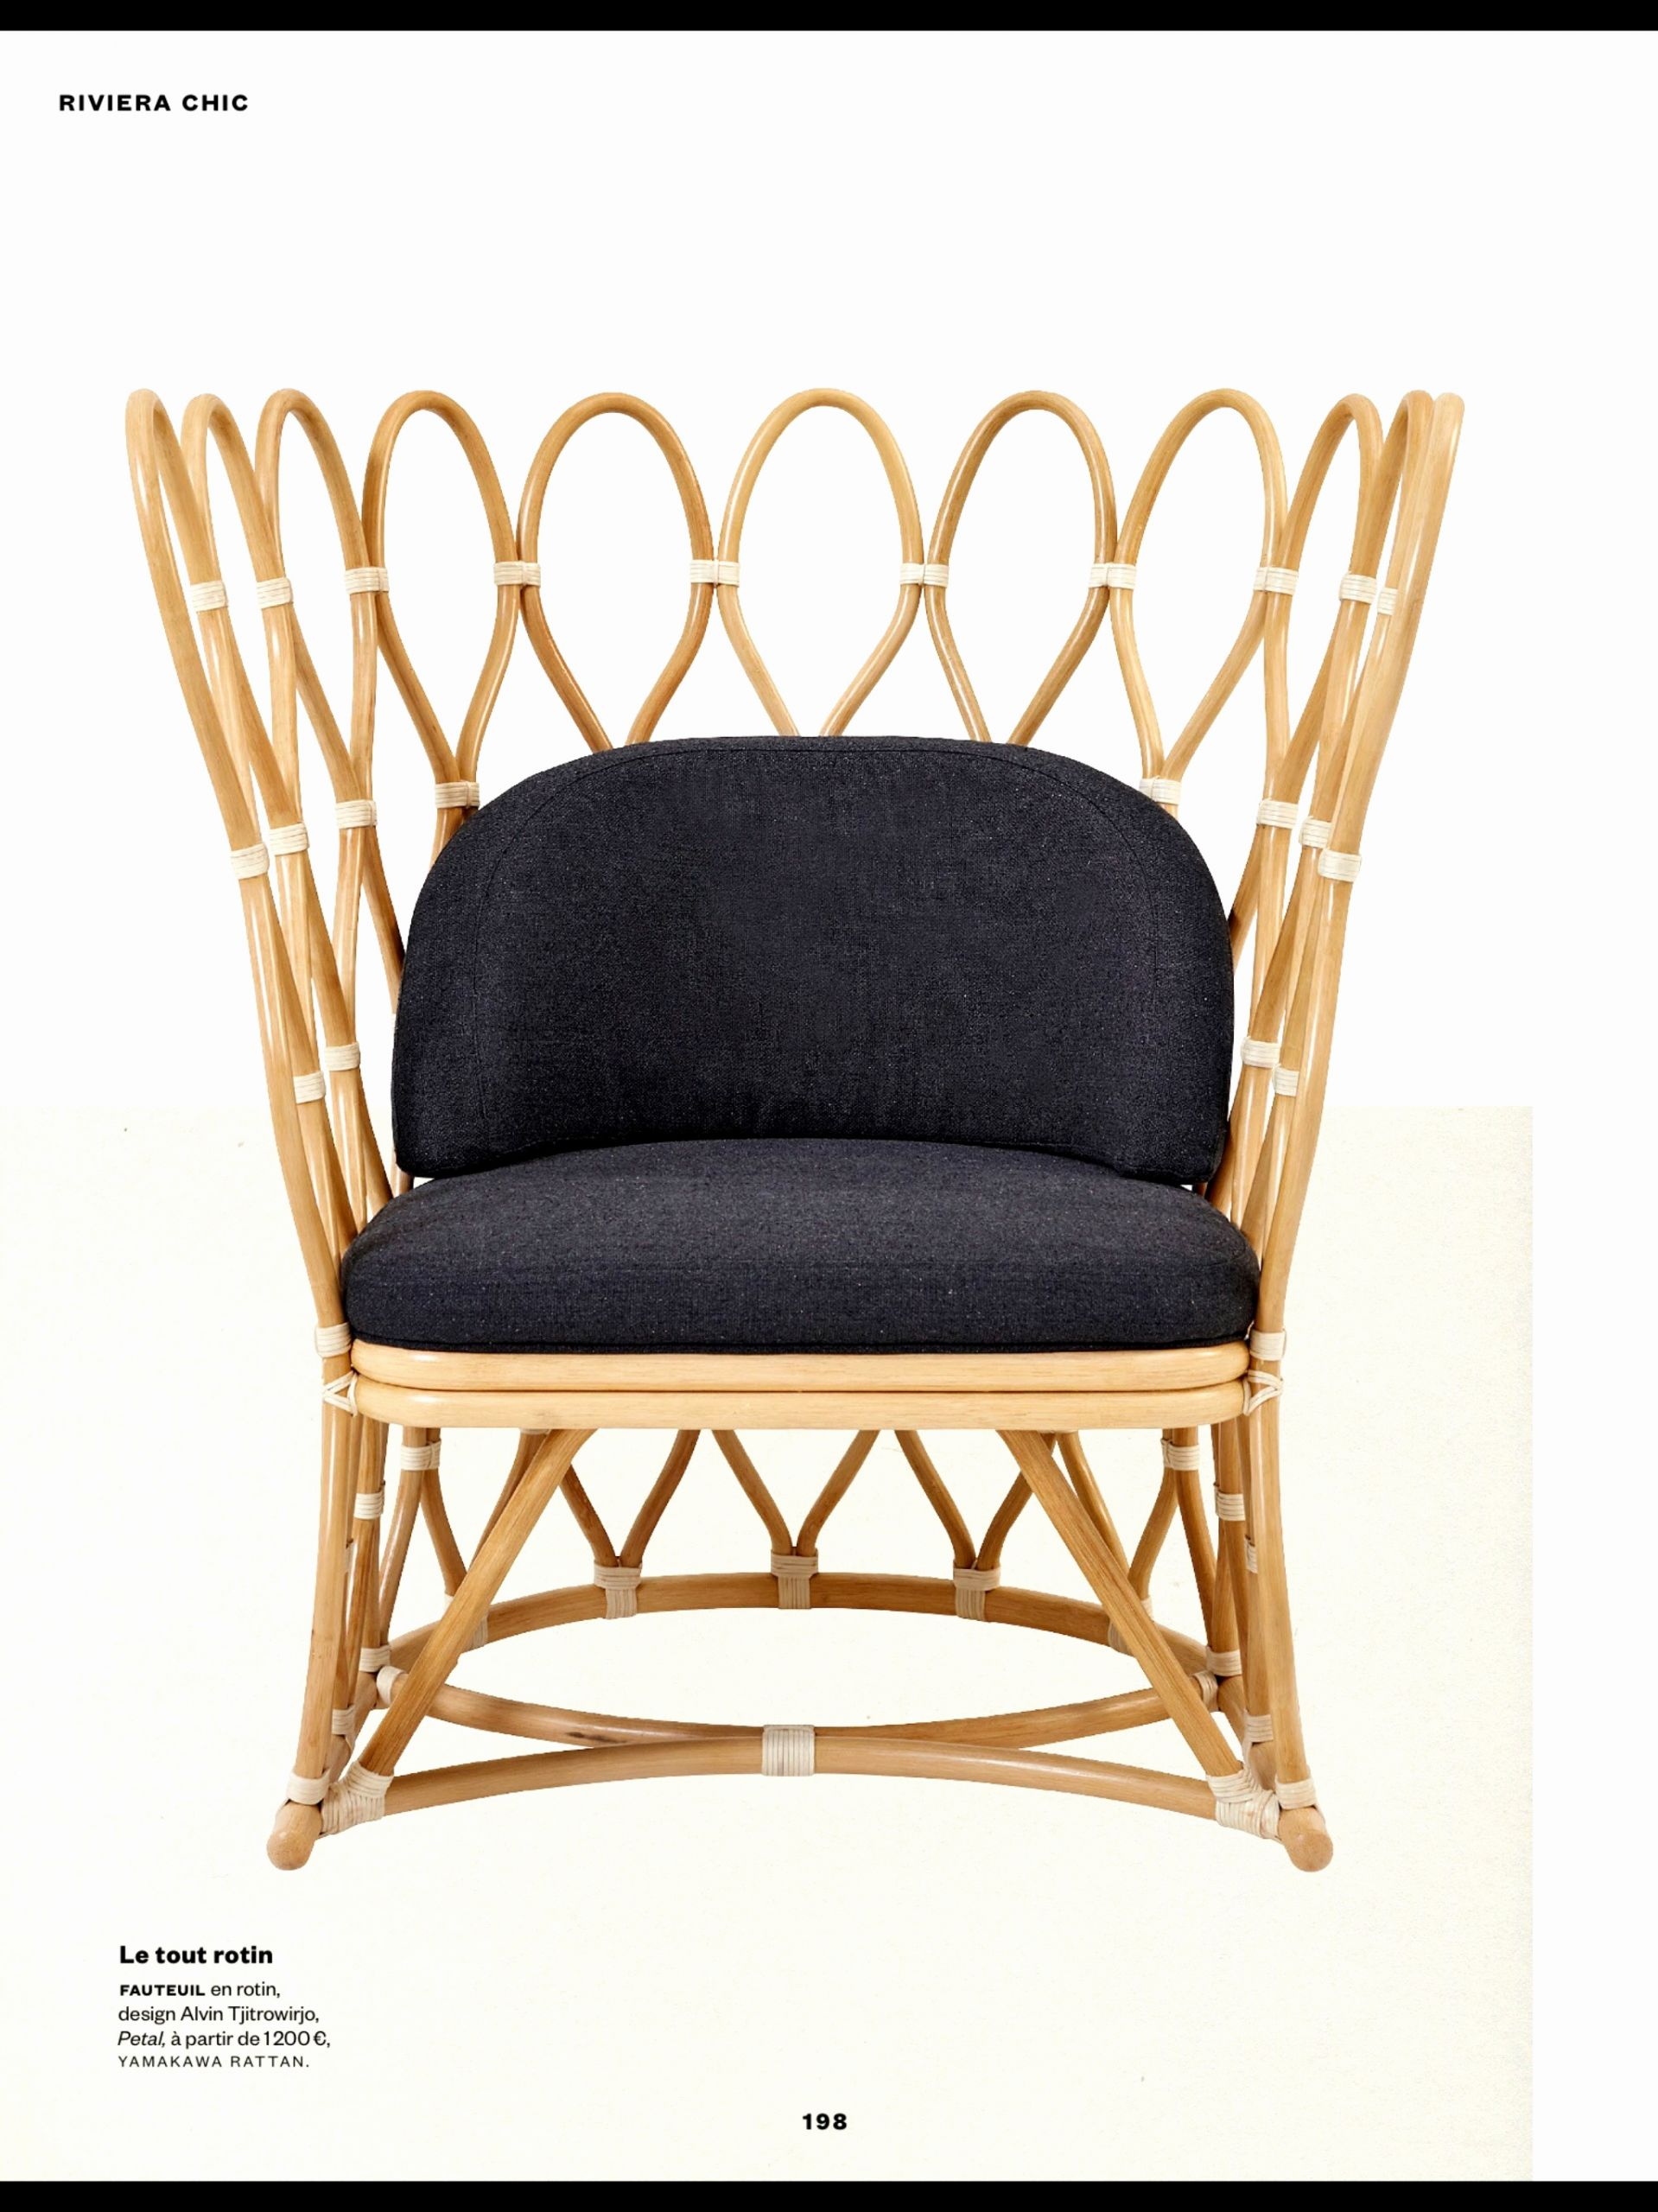 31 charmant chaise bistrot rotin pas cher salon jardin - Salon de jardin bistrot pas cher ...